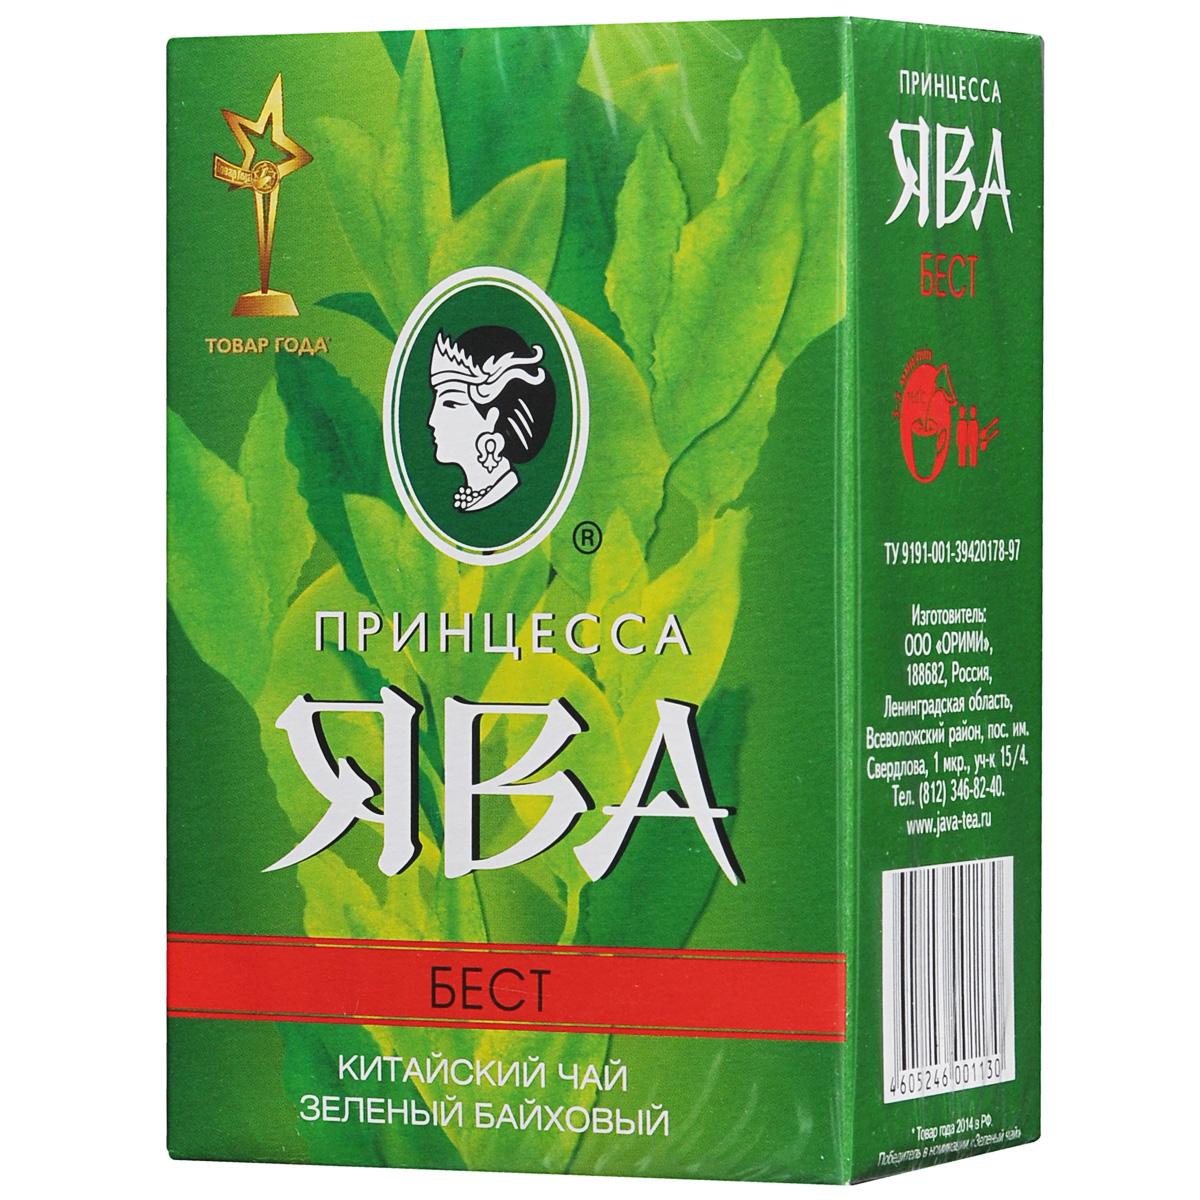 Принцесса Ява Бест зеленый чай листовой, 100 г бинокль veber classic бпц 8x30 vr серый